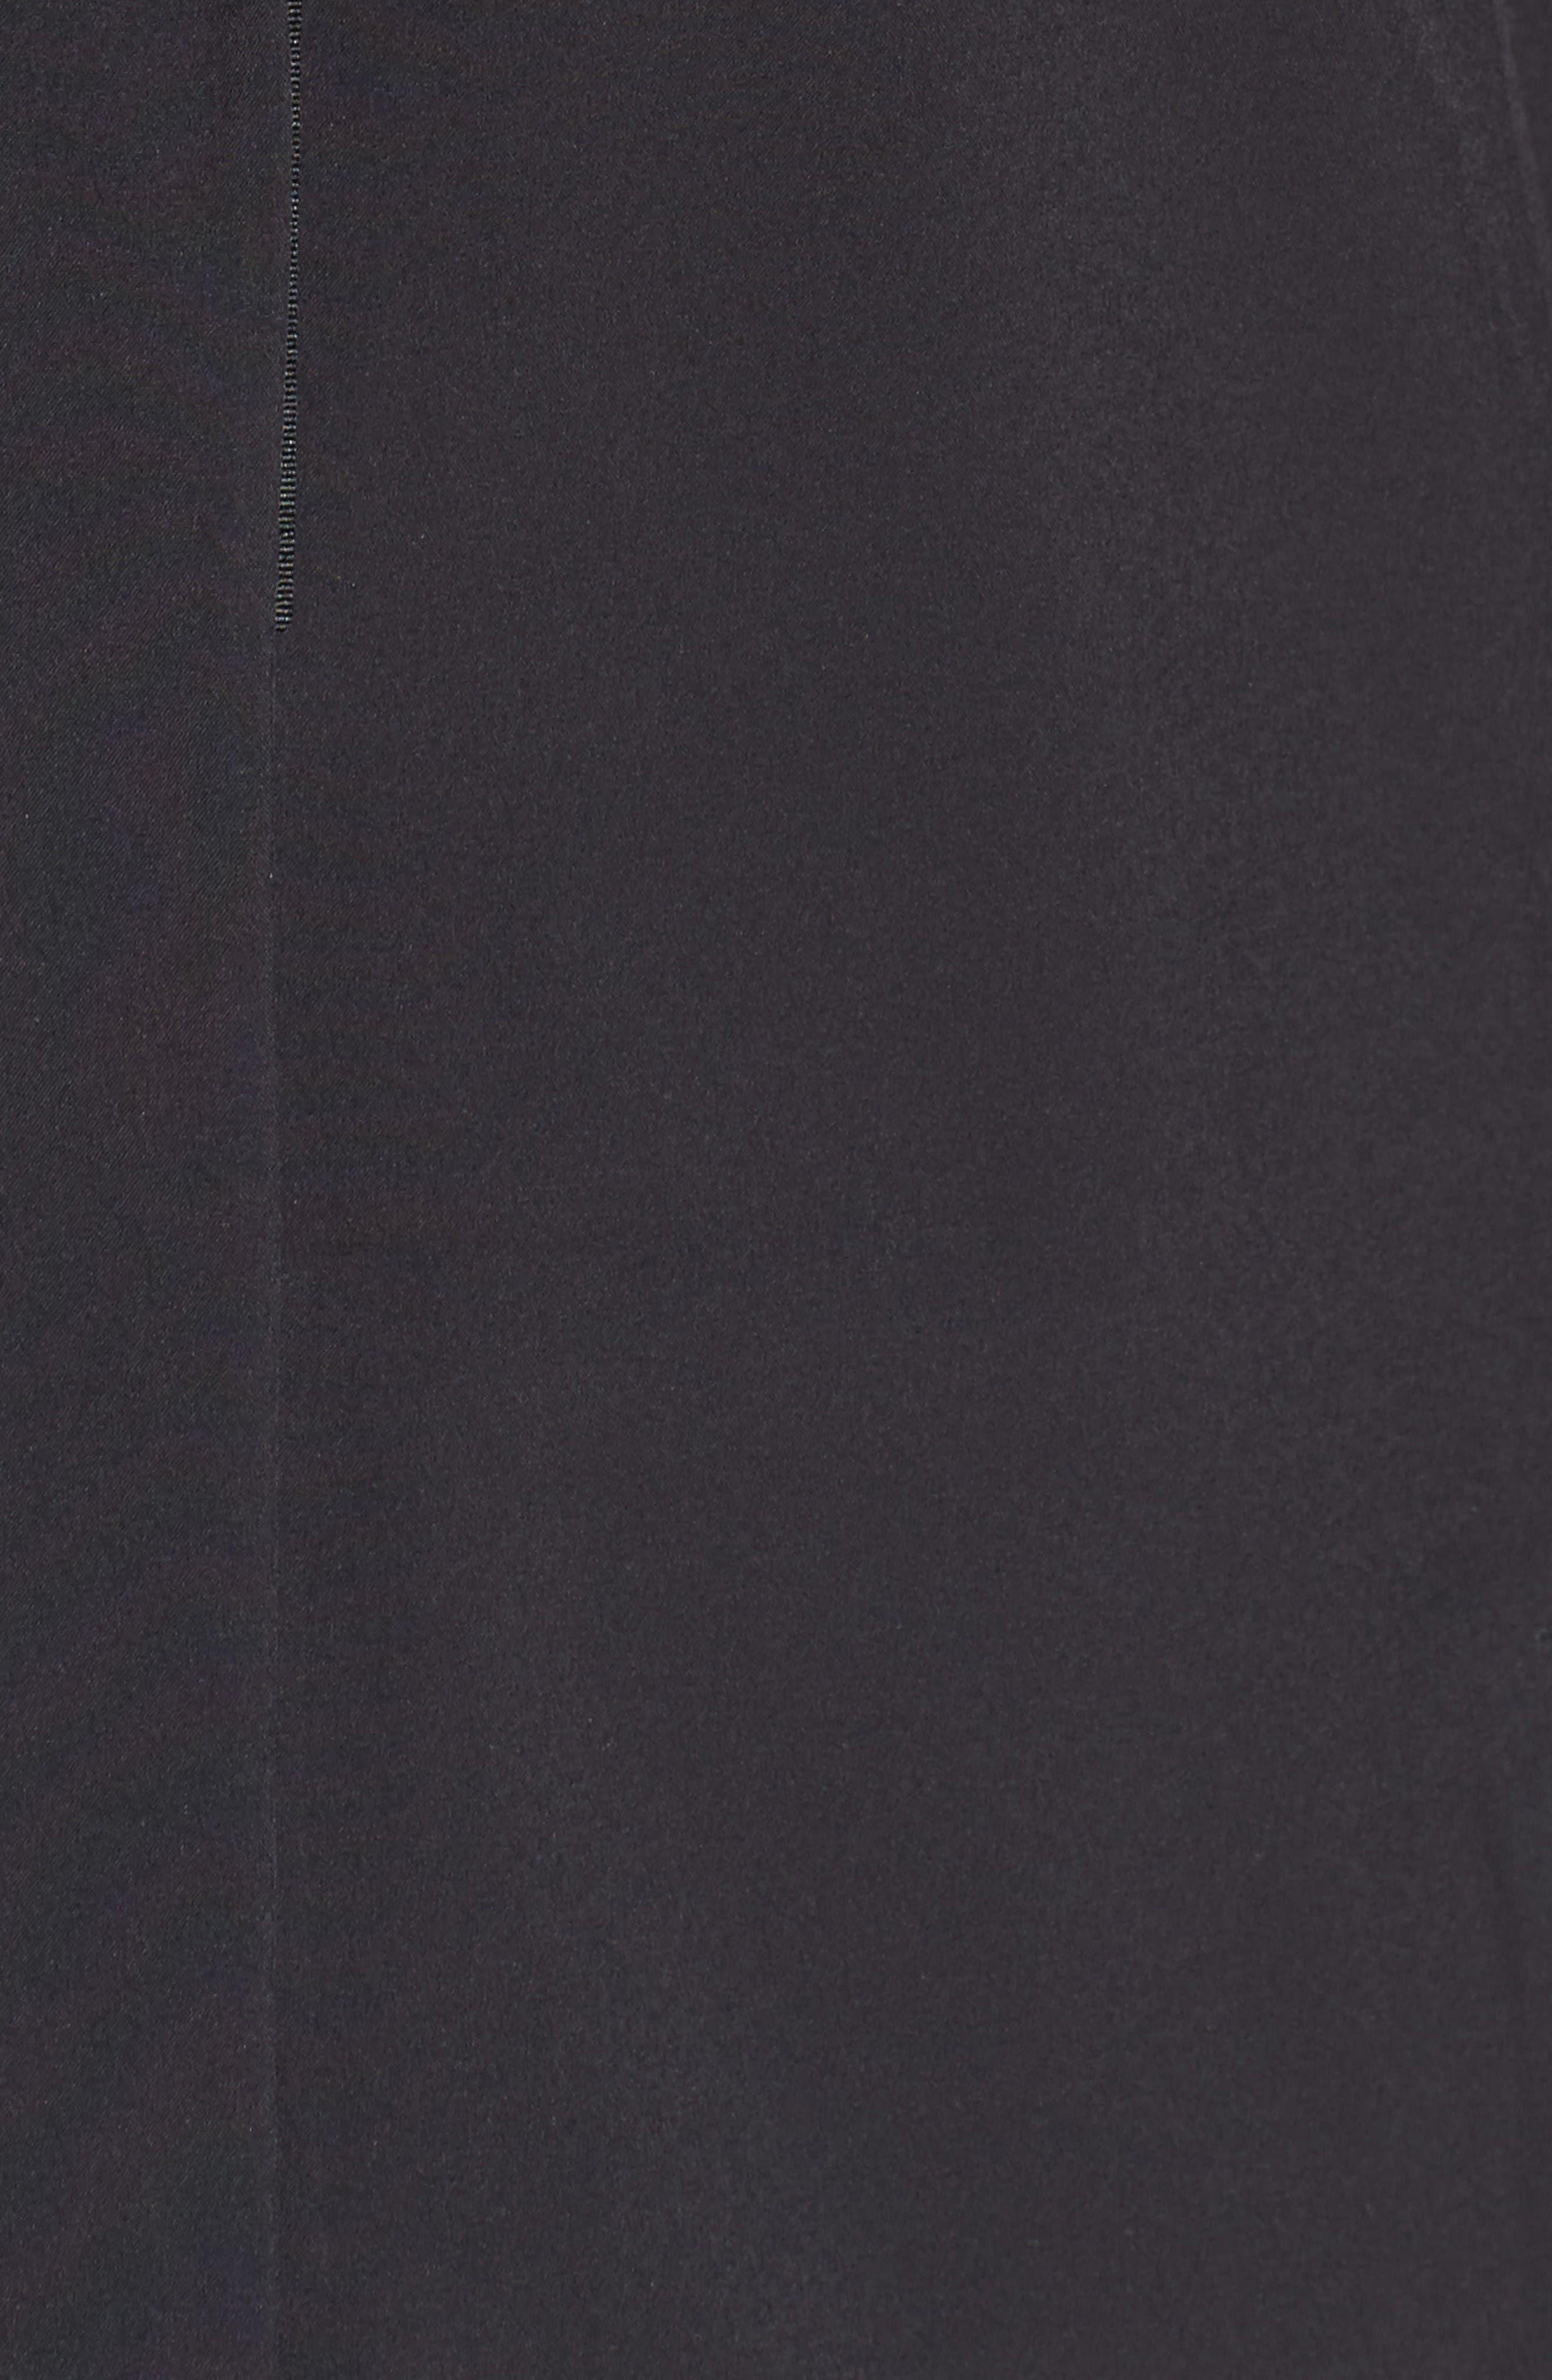 Apex Flex Gore-Tex<sup>®</sup> Disruptor Jacket,                             Alternate thumbnail 6, color,                             Tnf Black/ Tnf Dark Grey